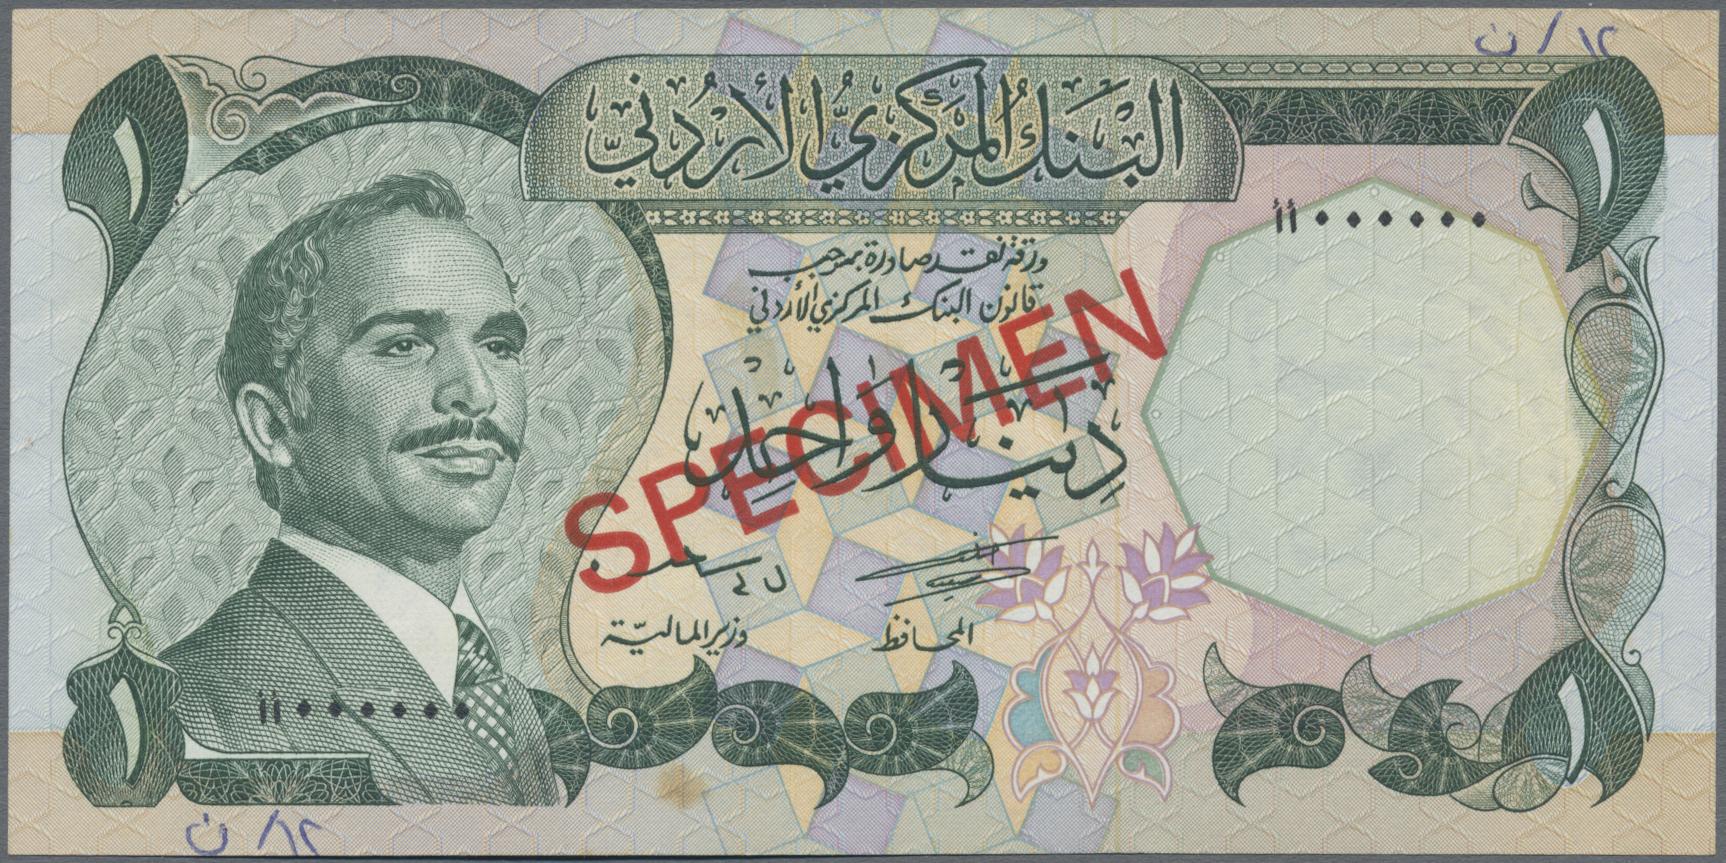 Lot 00485 - Jordan / Jordanien | Banknoten  -  Auktionshaus Christoph Gärtner GmbH & Co. KG Sale #48 The Banknotes